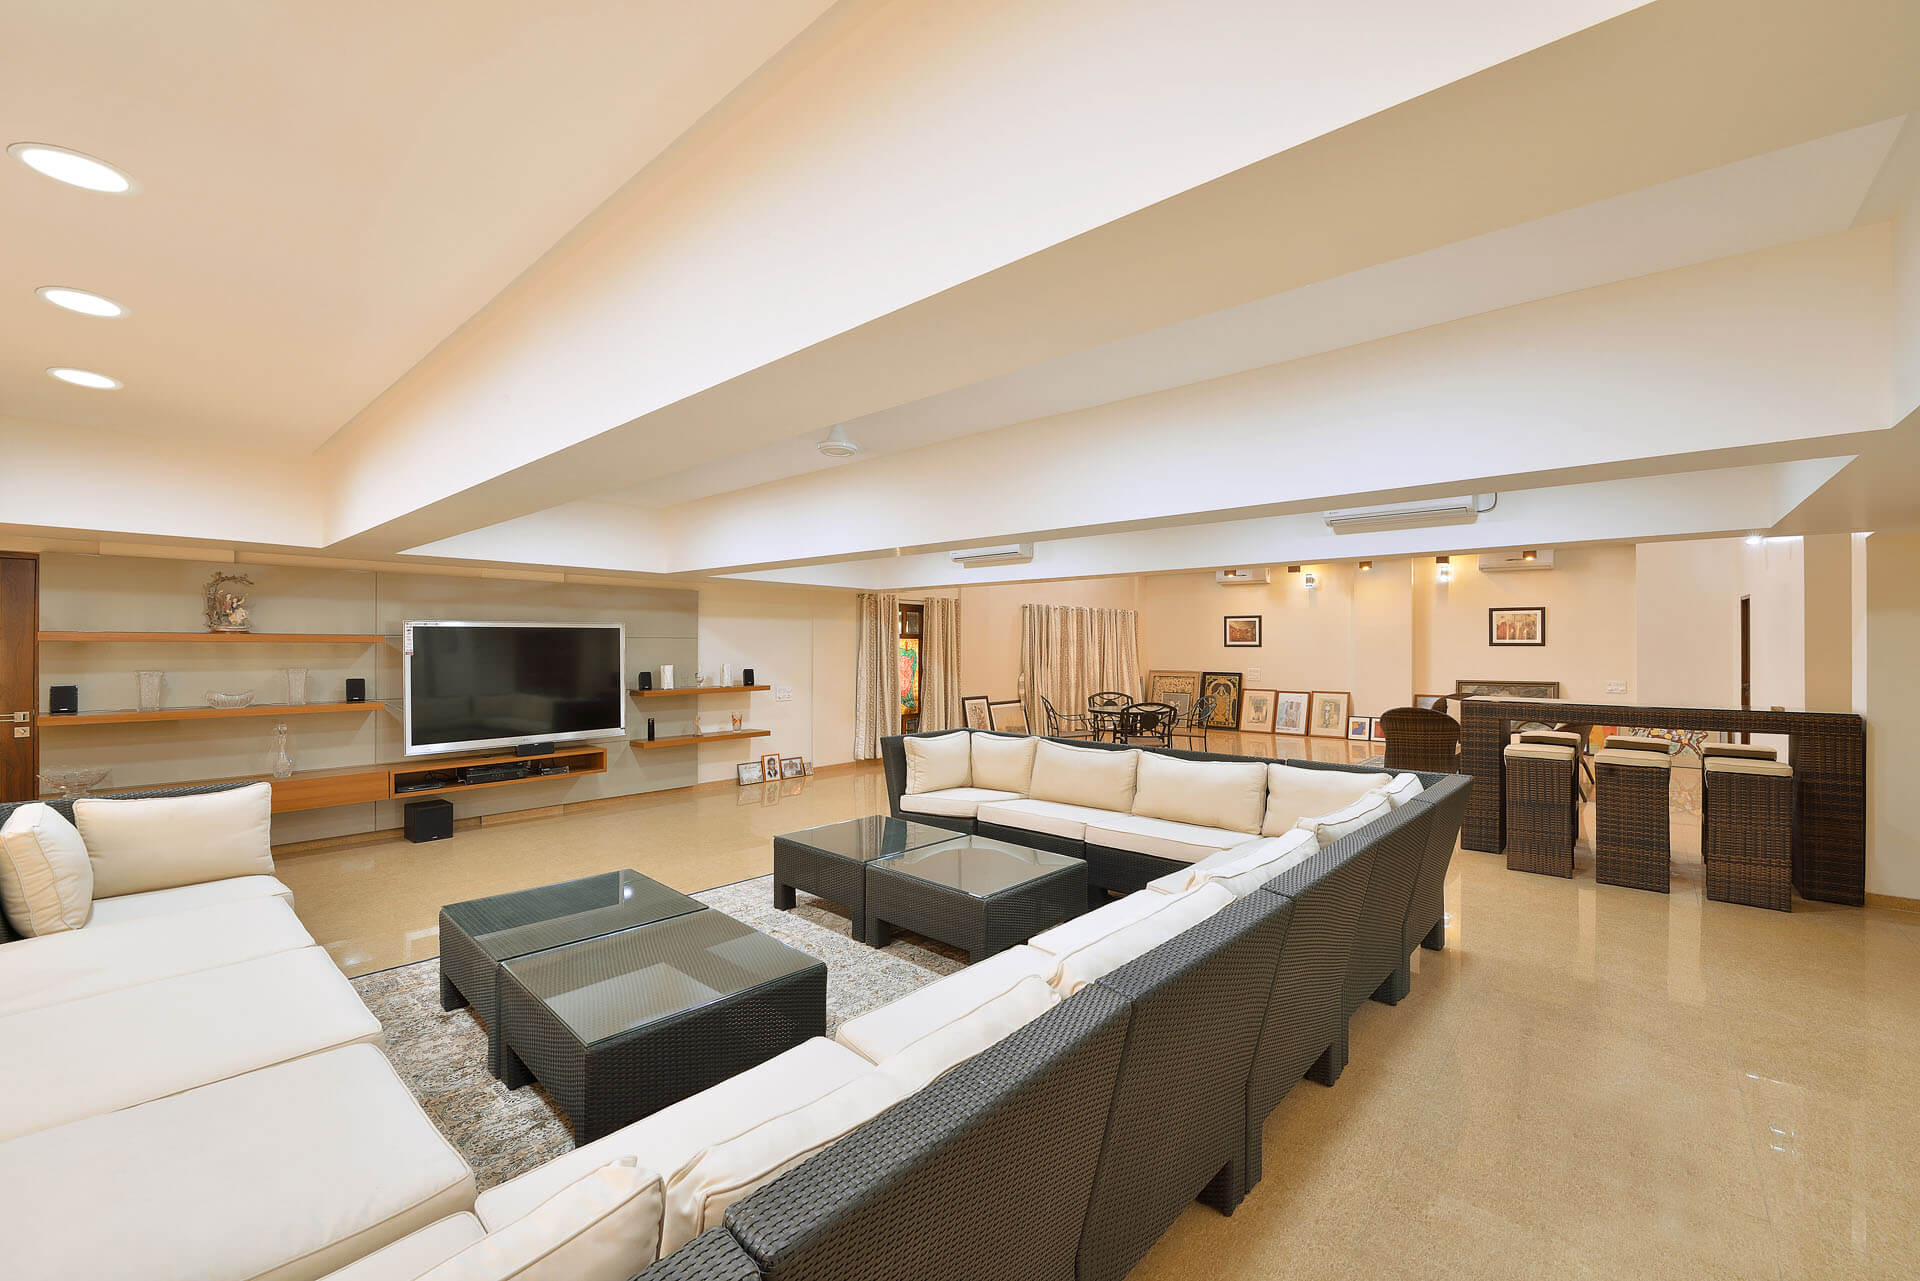 Garden Glory Penthouse- Indian Family- Thane- India (7) (1)